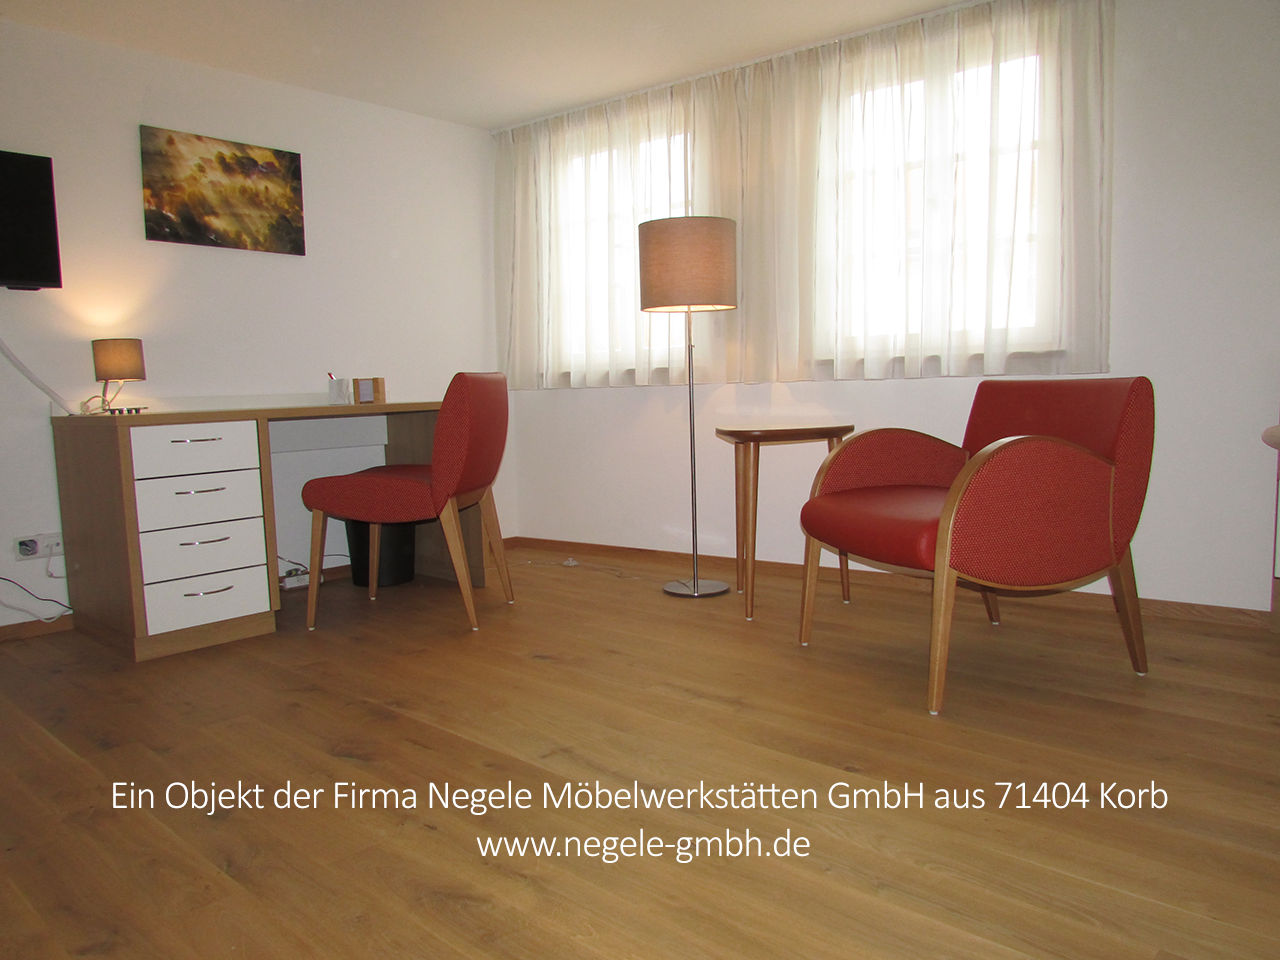 Ein Objekt der Firma Negele Möbelwerkstätten GmbH aus 71404 Korb www.negele-gmbh.de